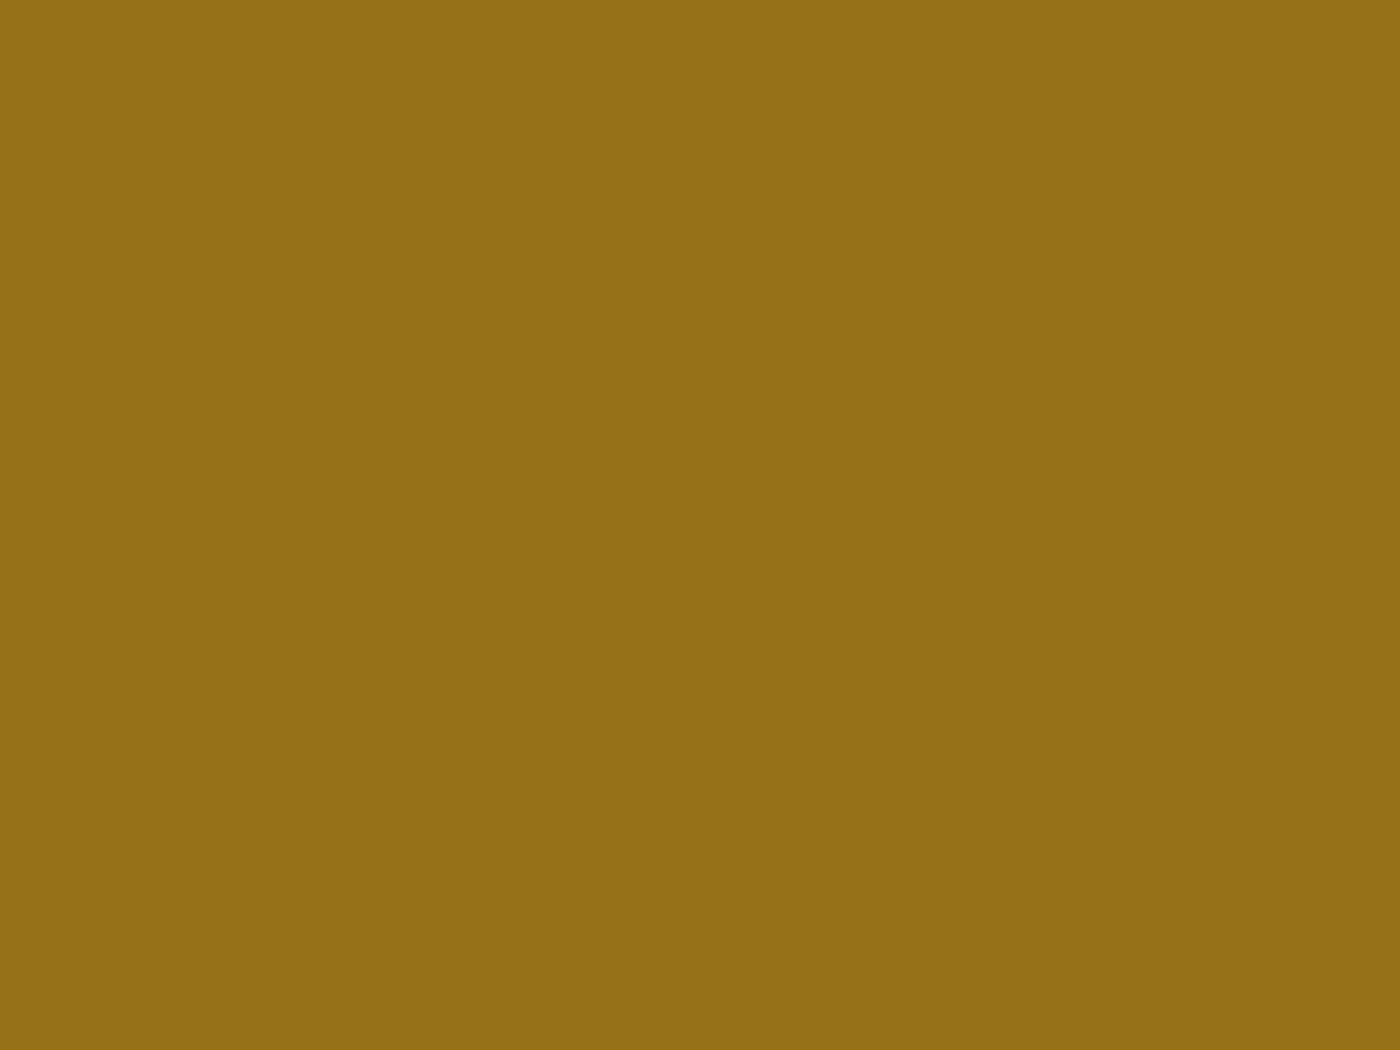 1400x1050 Bistre Brown Solid Color Background